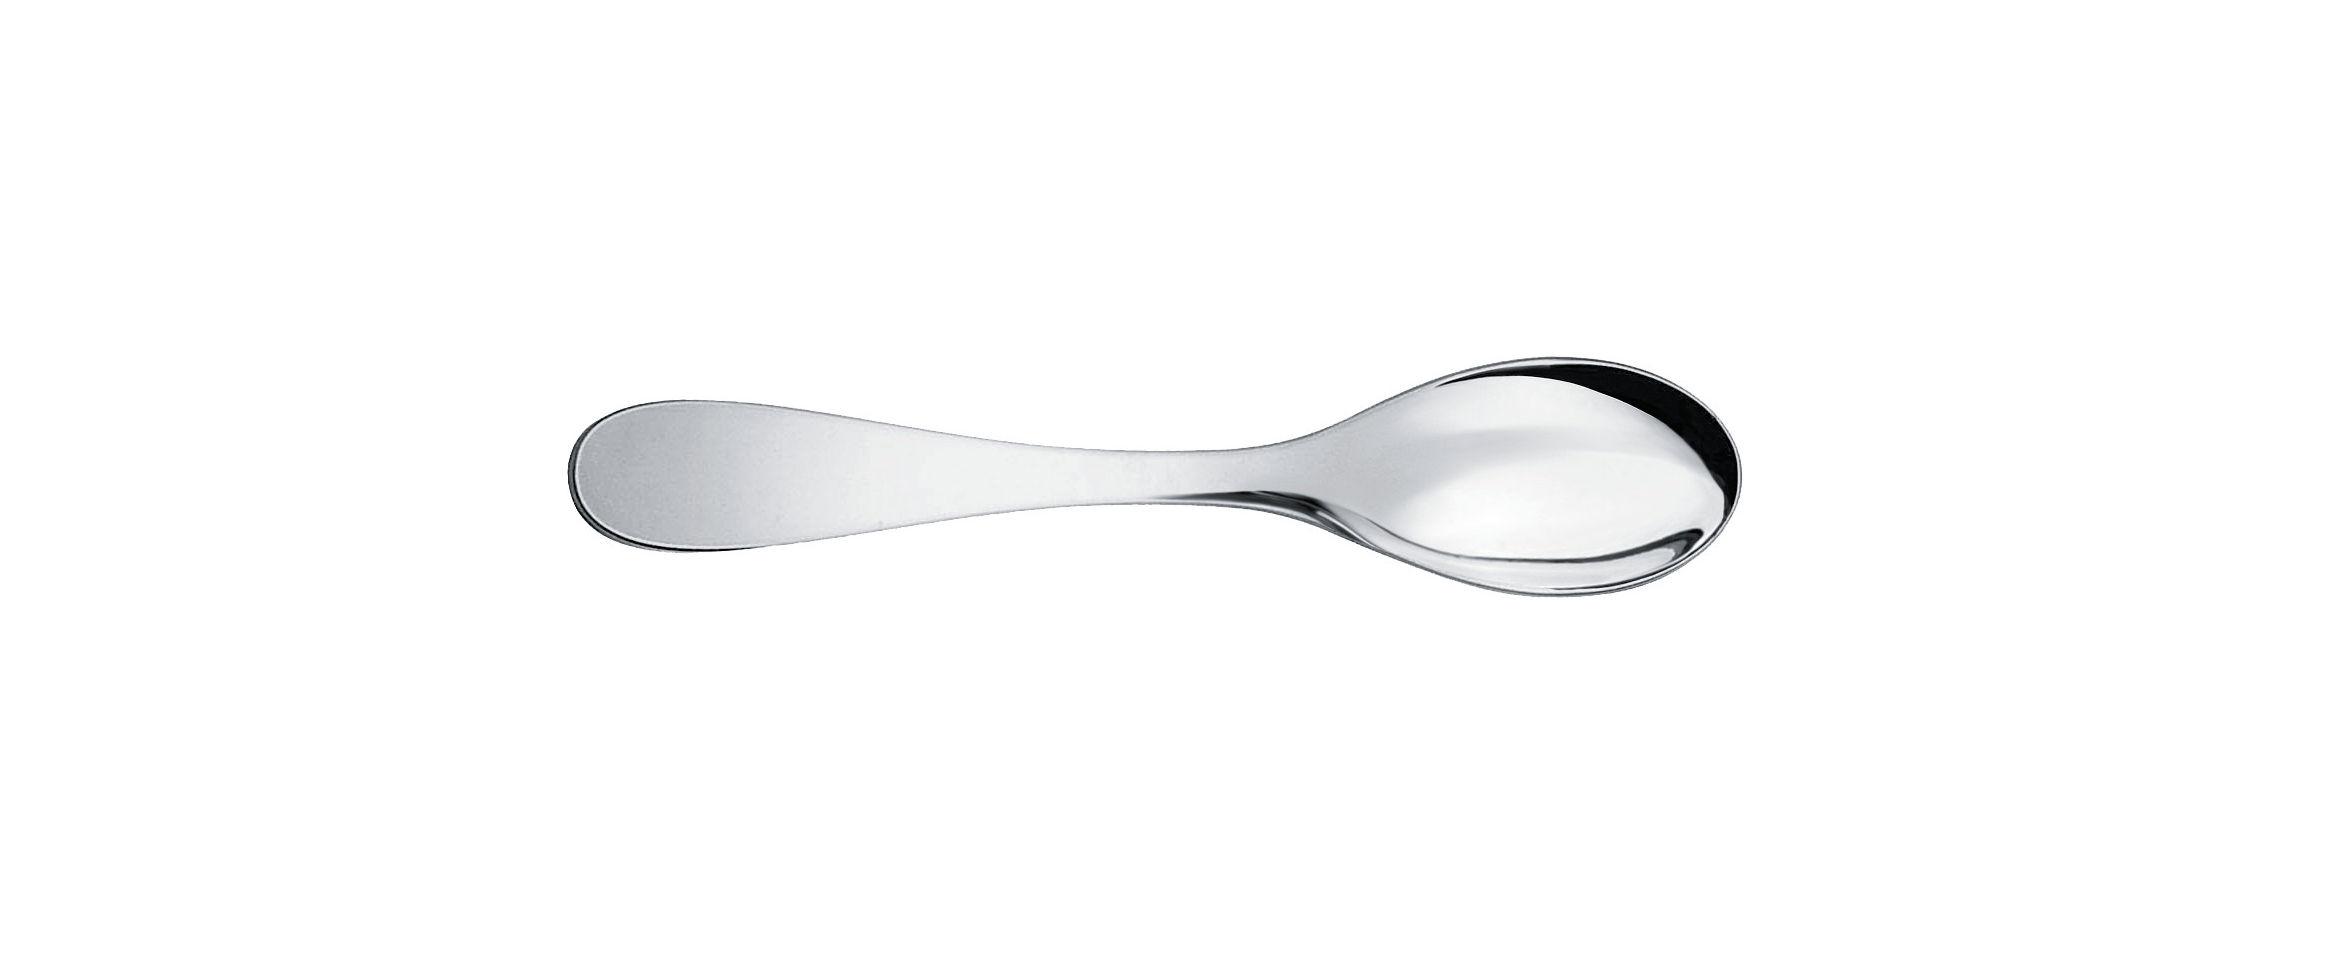 Tischkultur - Bestecke - Eat.it Kaffeelöffel - Alessi - Kaffeelöffel / L 12,7 cm - Acier inoxydable 18/10